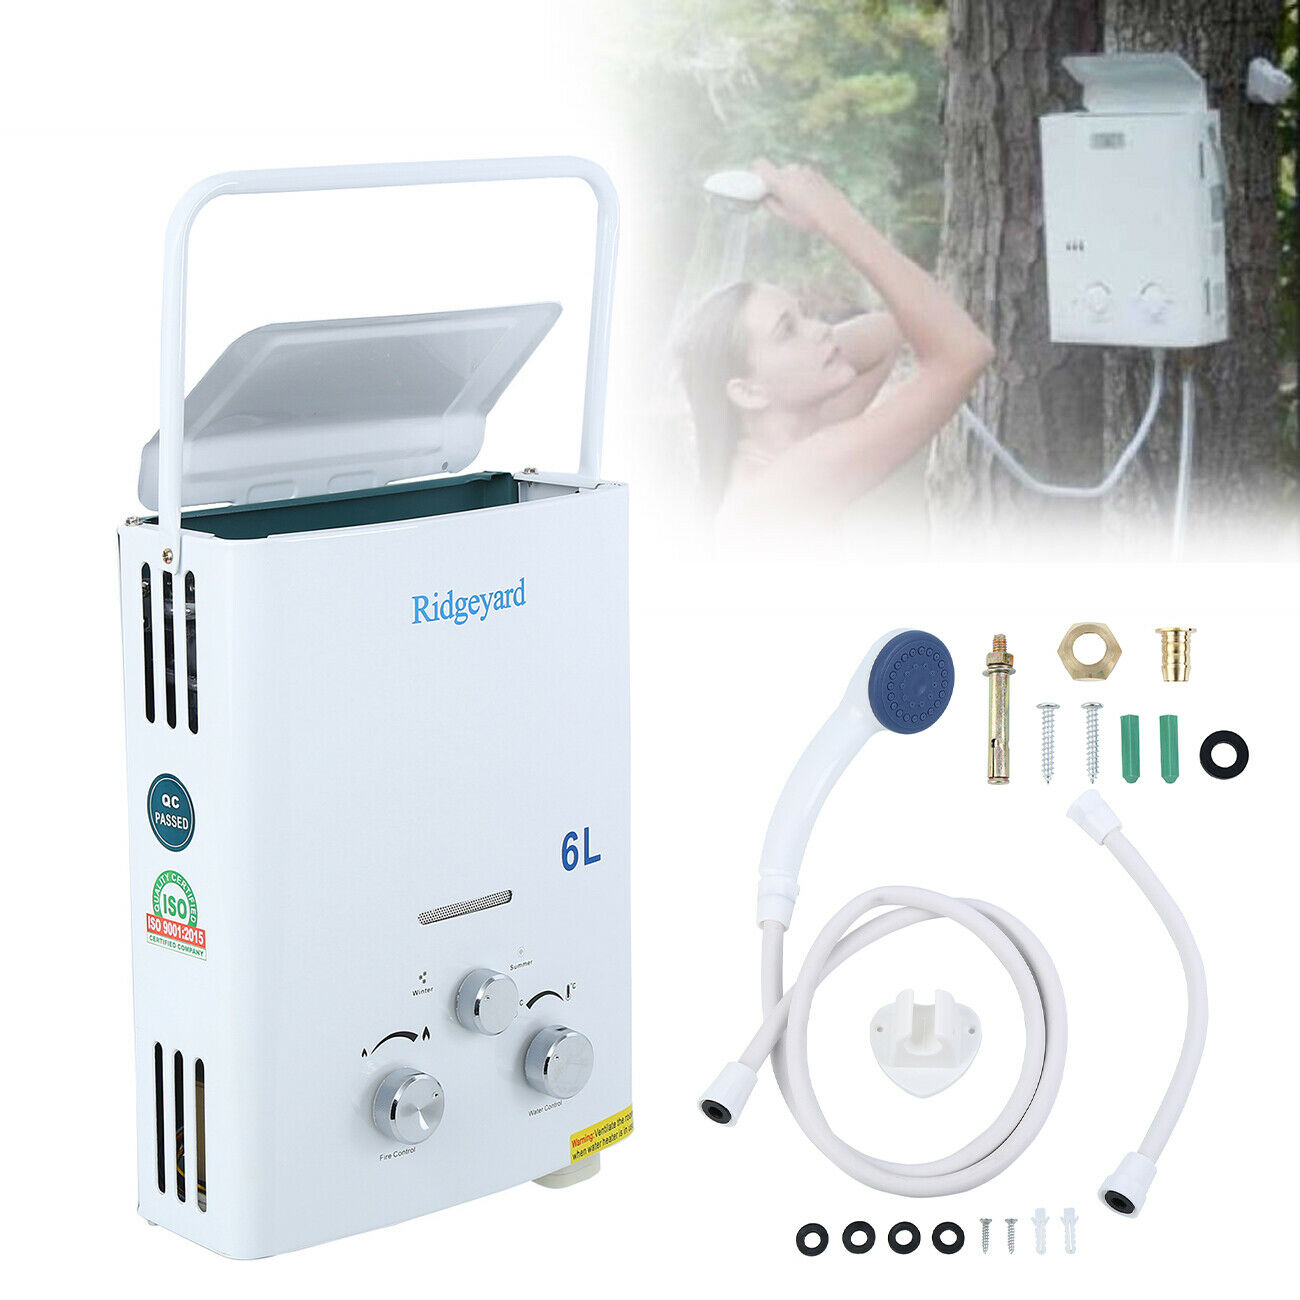 6L LPG Propane Gas Tankless Water Heater Instant Bath With Shower Head Hot Water Heater Boiler Calorifier EU Shipping